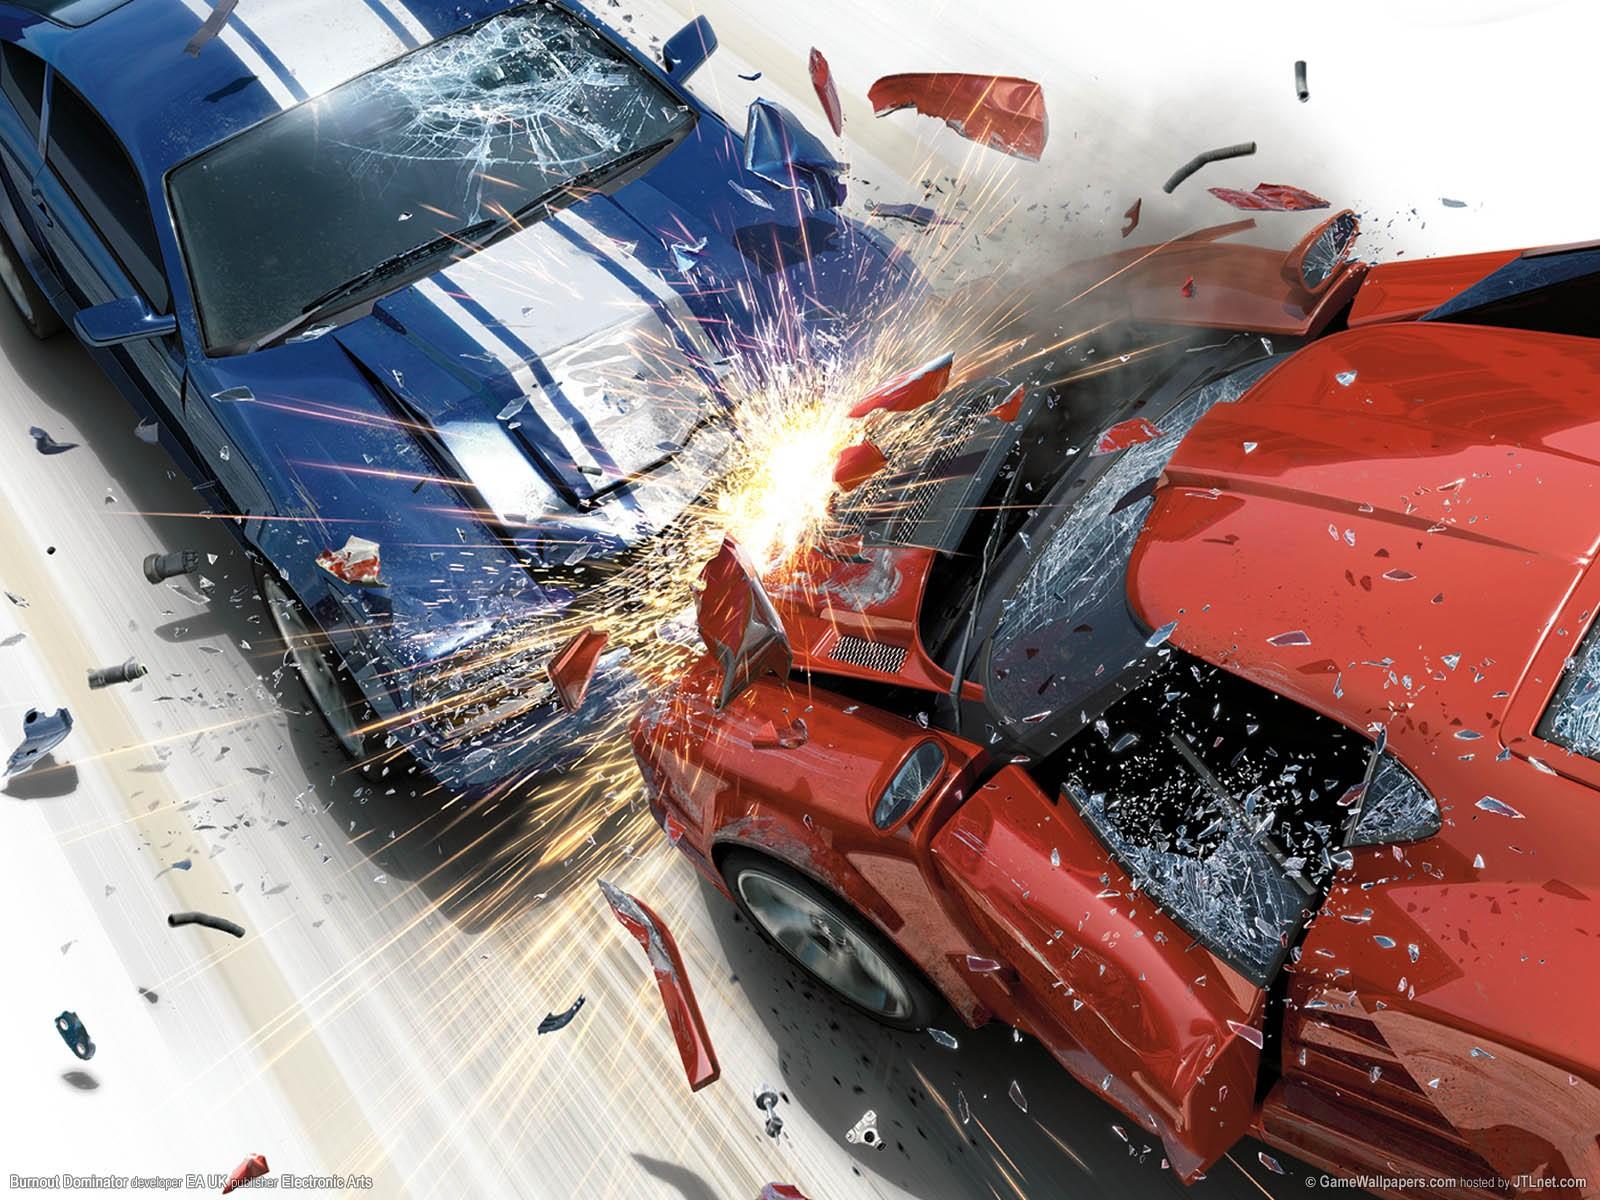 Delightful Wallpaper : Video Games, Lamborghini, Muscle Cars, Sports Car, Crash,  Destruction, Burnout Dominator, Burnout Video Game, Kaza, Supercar,  Screenshot, ...